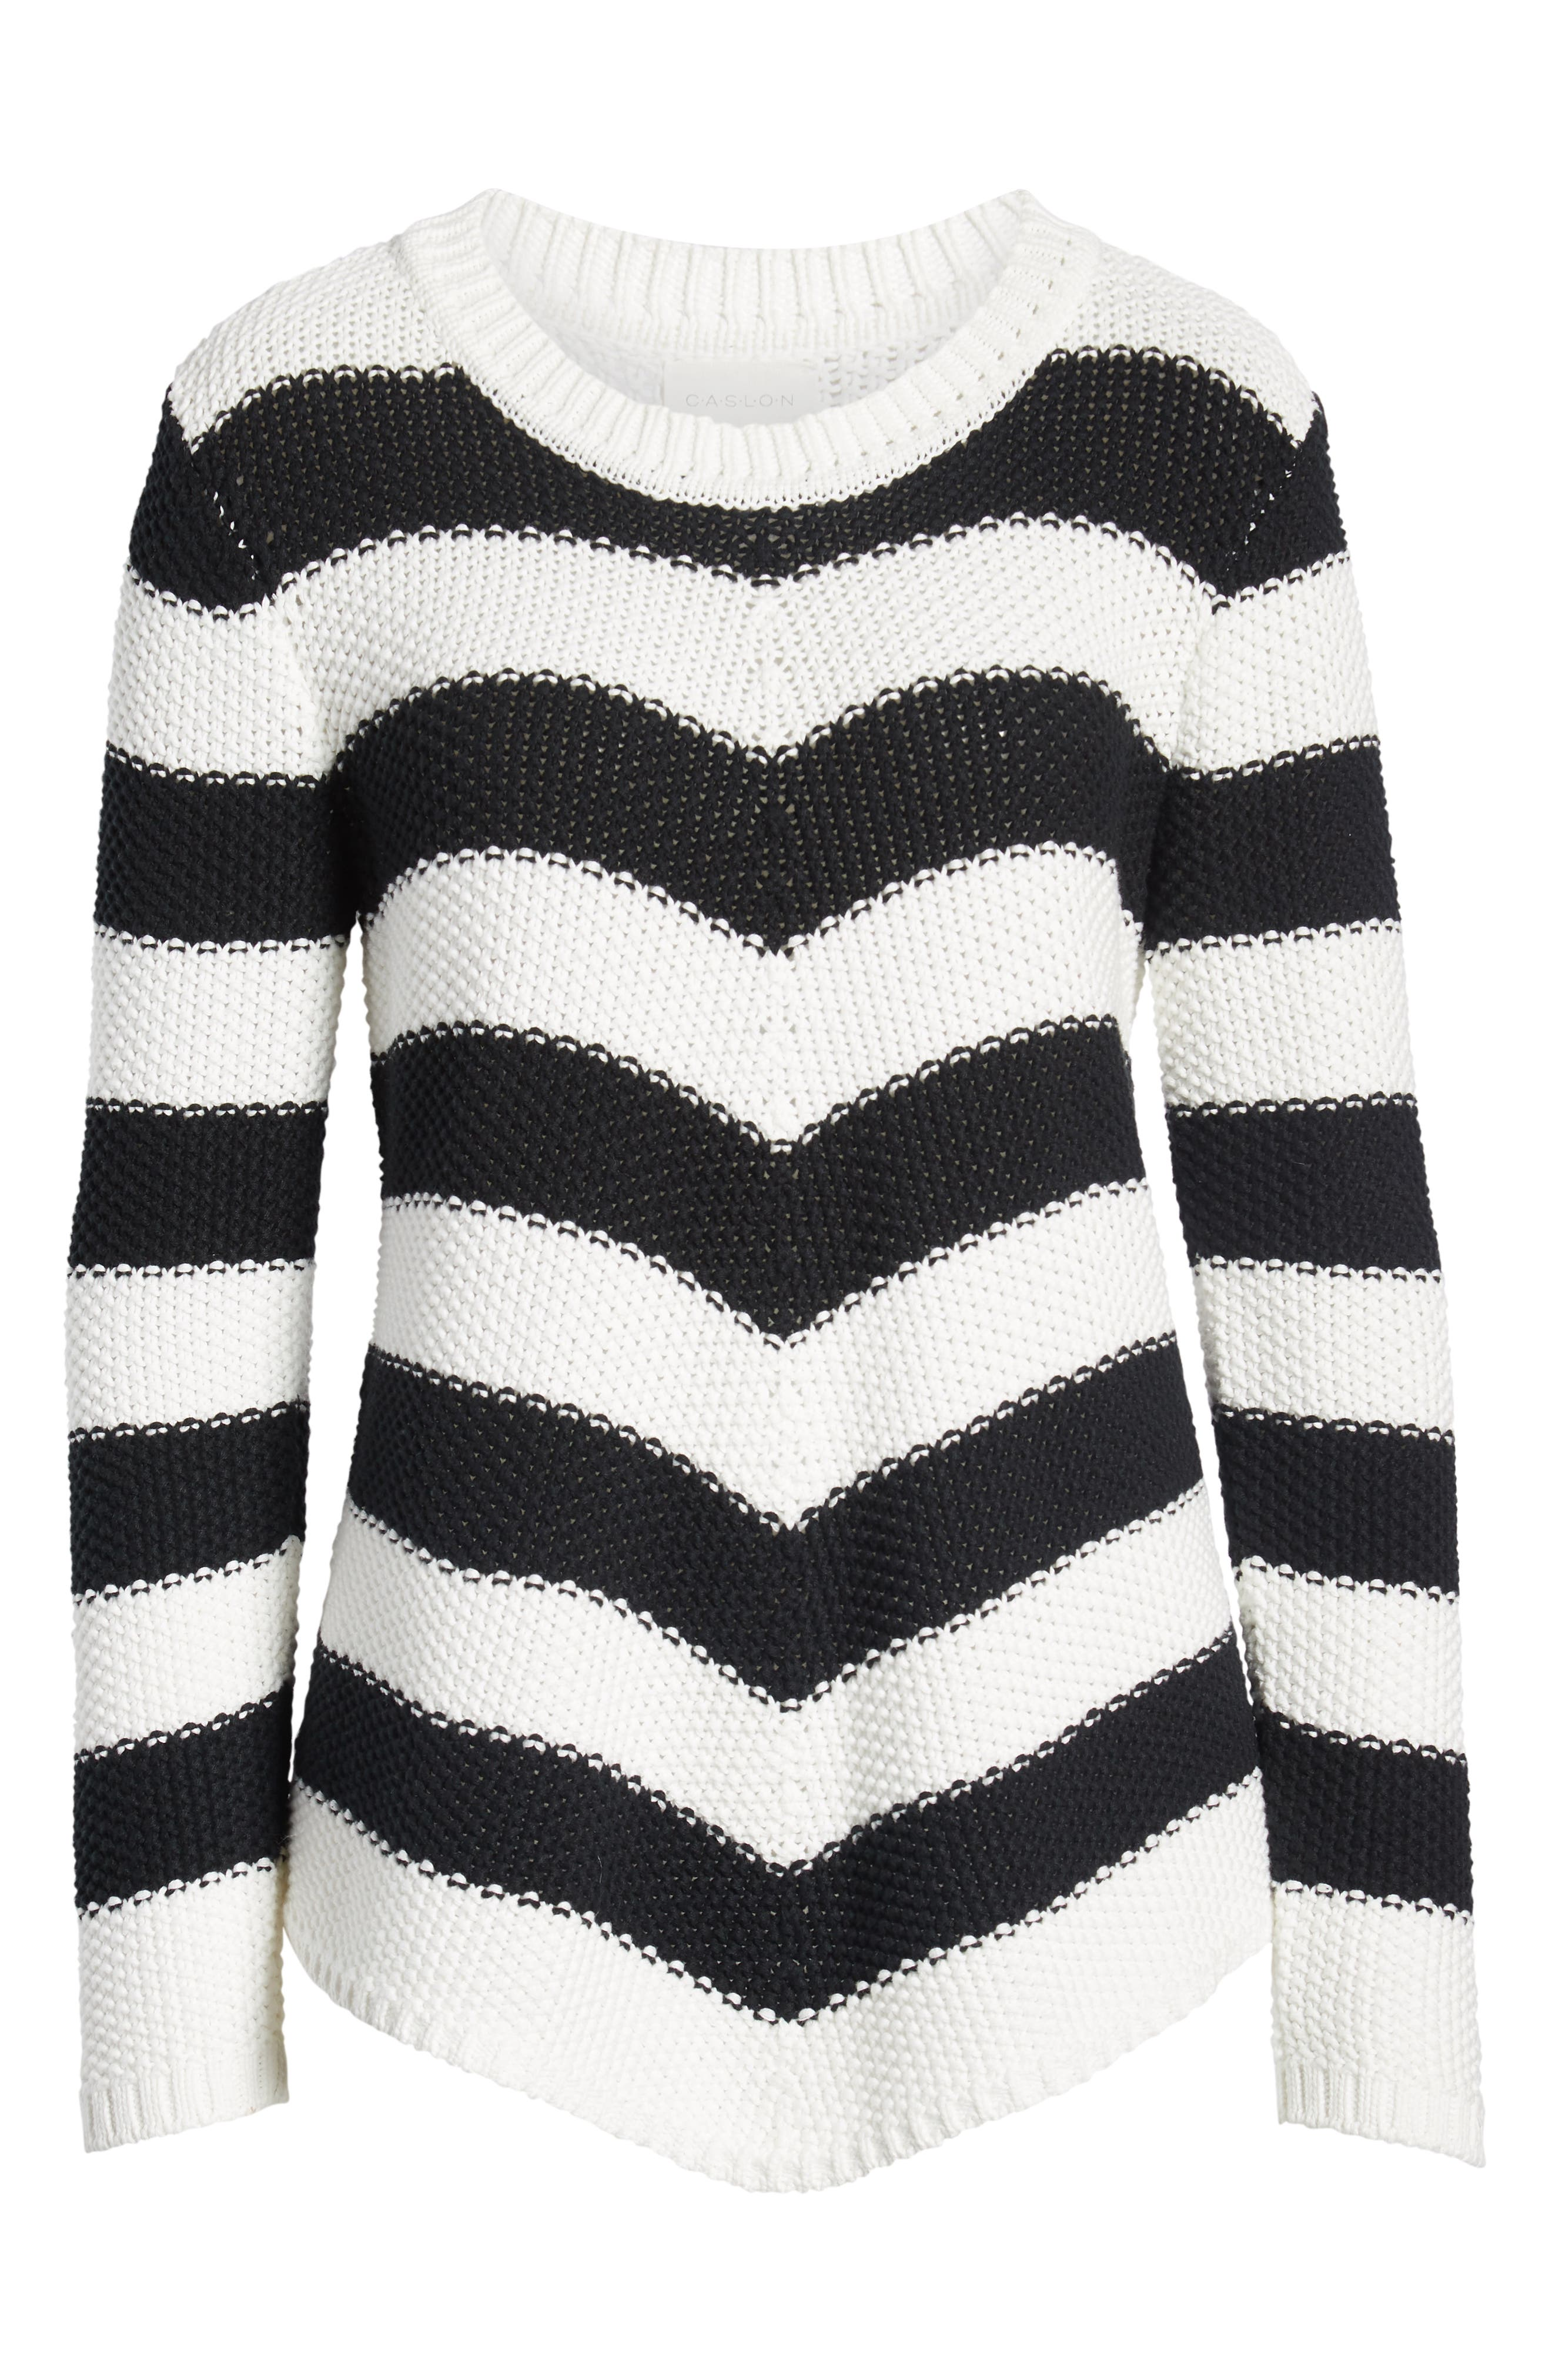 Stitch Stripe Sweater,                             Alternate thumbnail 6, color,                             BLACK- IVORY GABRIELLA STRIPE